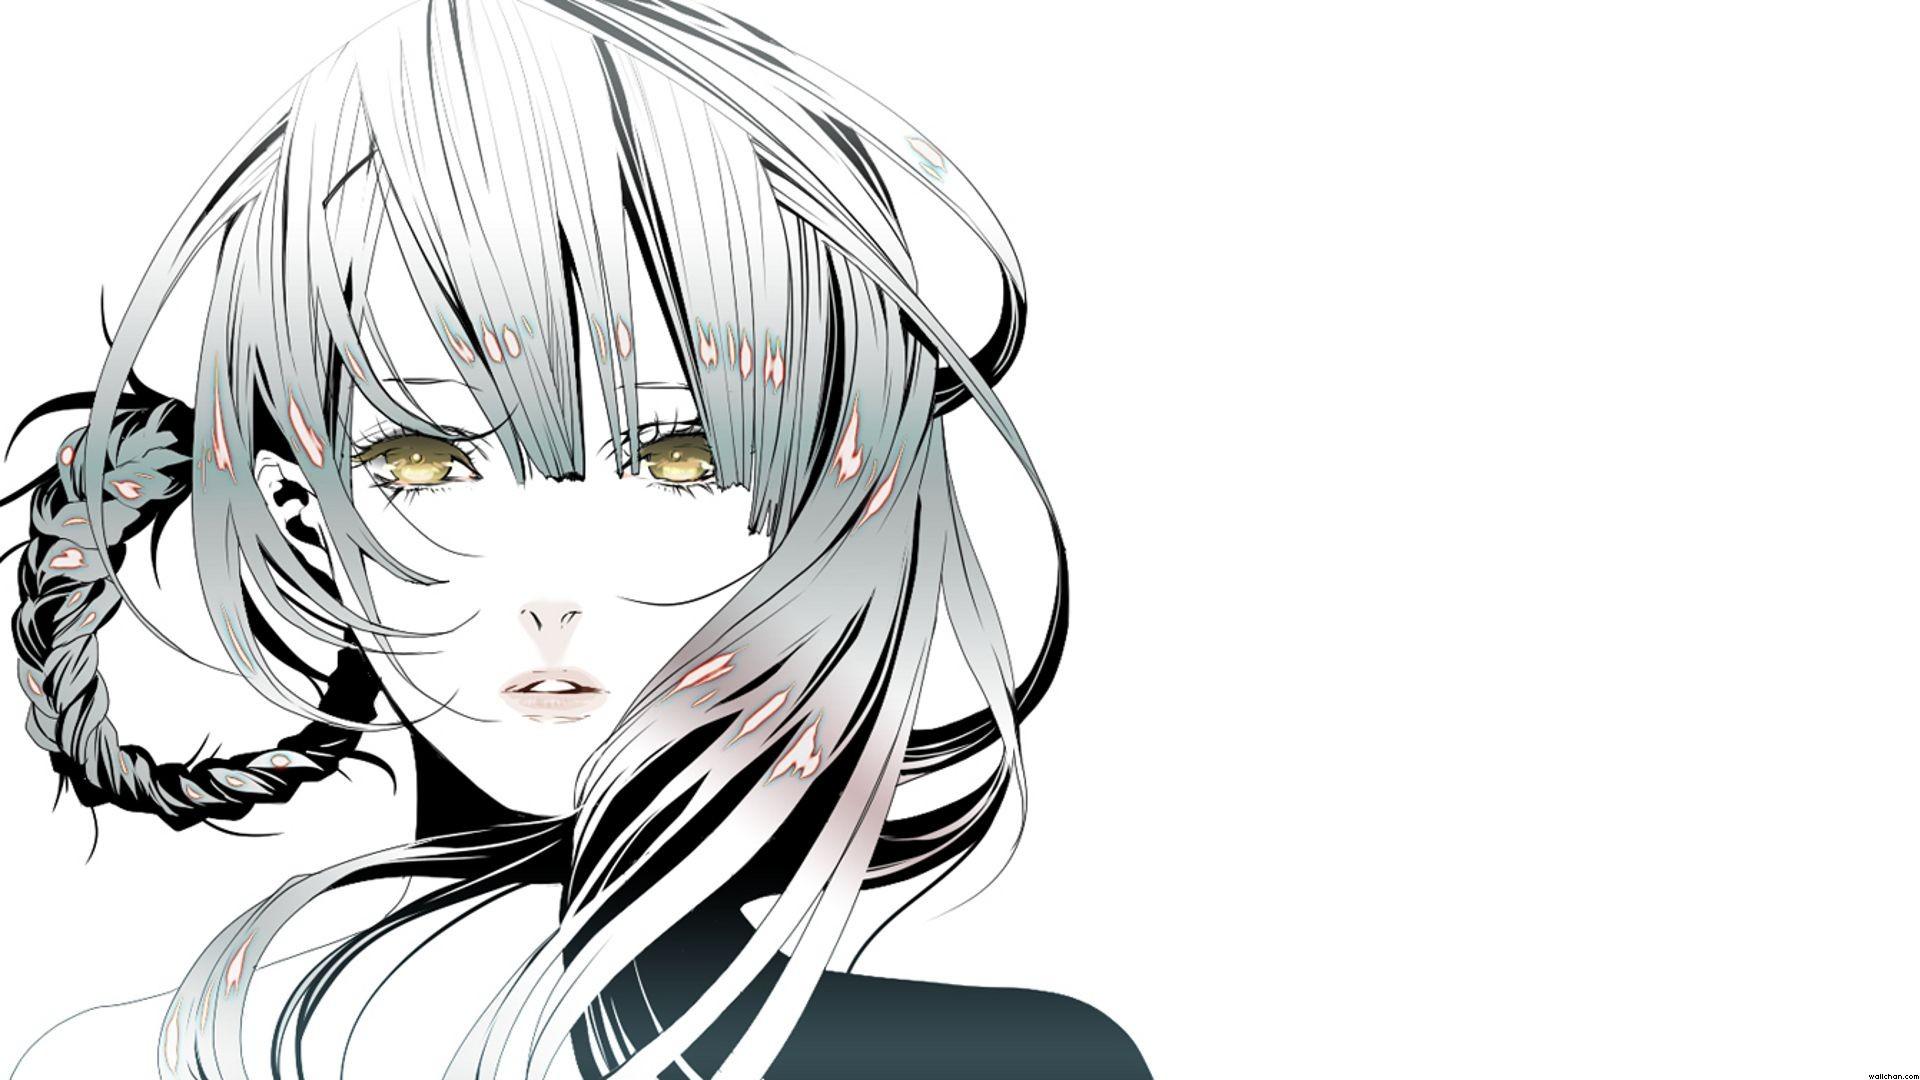 Anime 1920x1080 anime girls white simple background Kaine (NieR) NieR